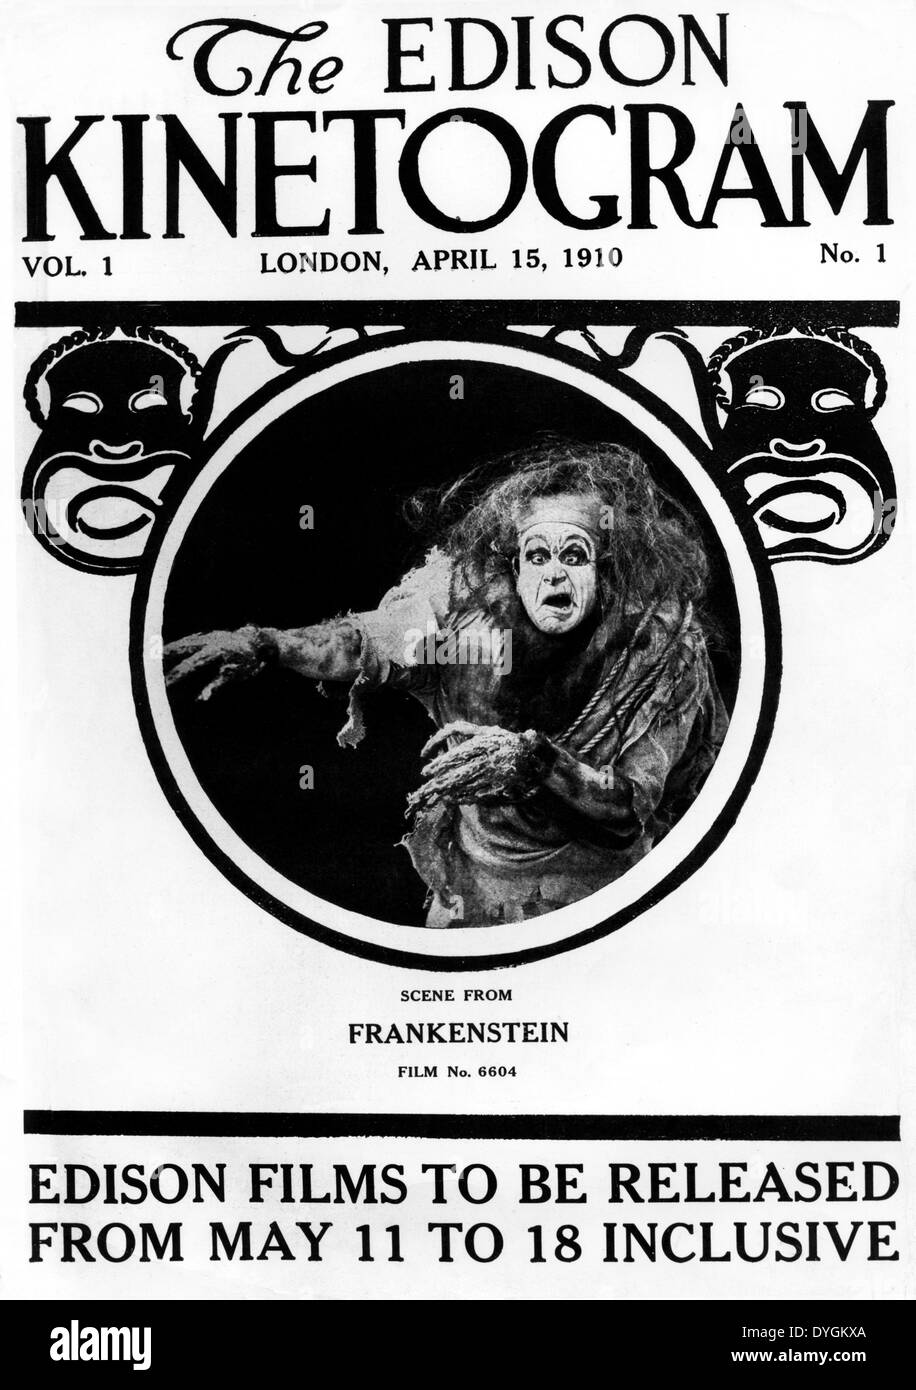 FRANKENSTEIN (1910) J SEARLE DAWLEY (DIR) ANKE 001 MOVIESTORE COLLECTION LTD Stock Photo